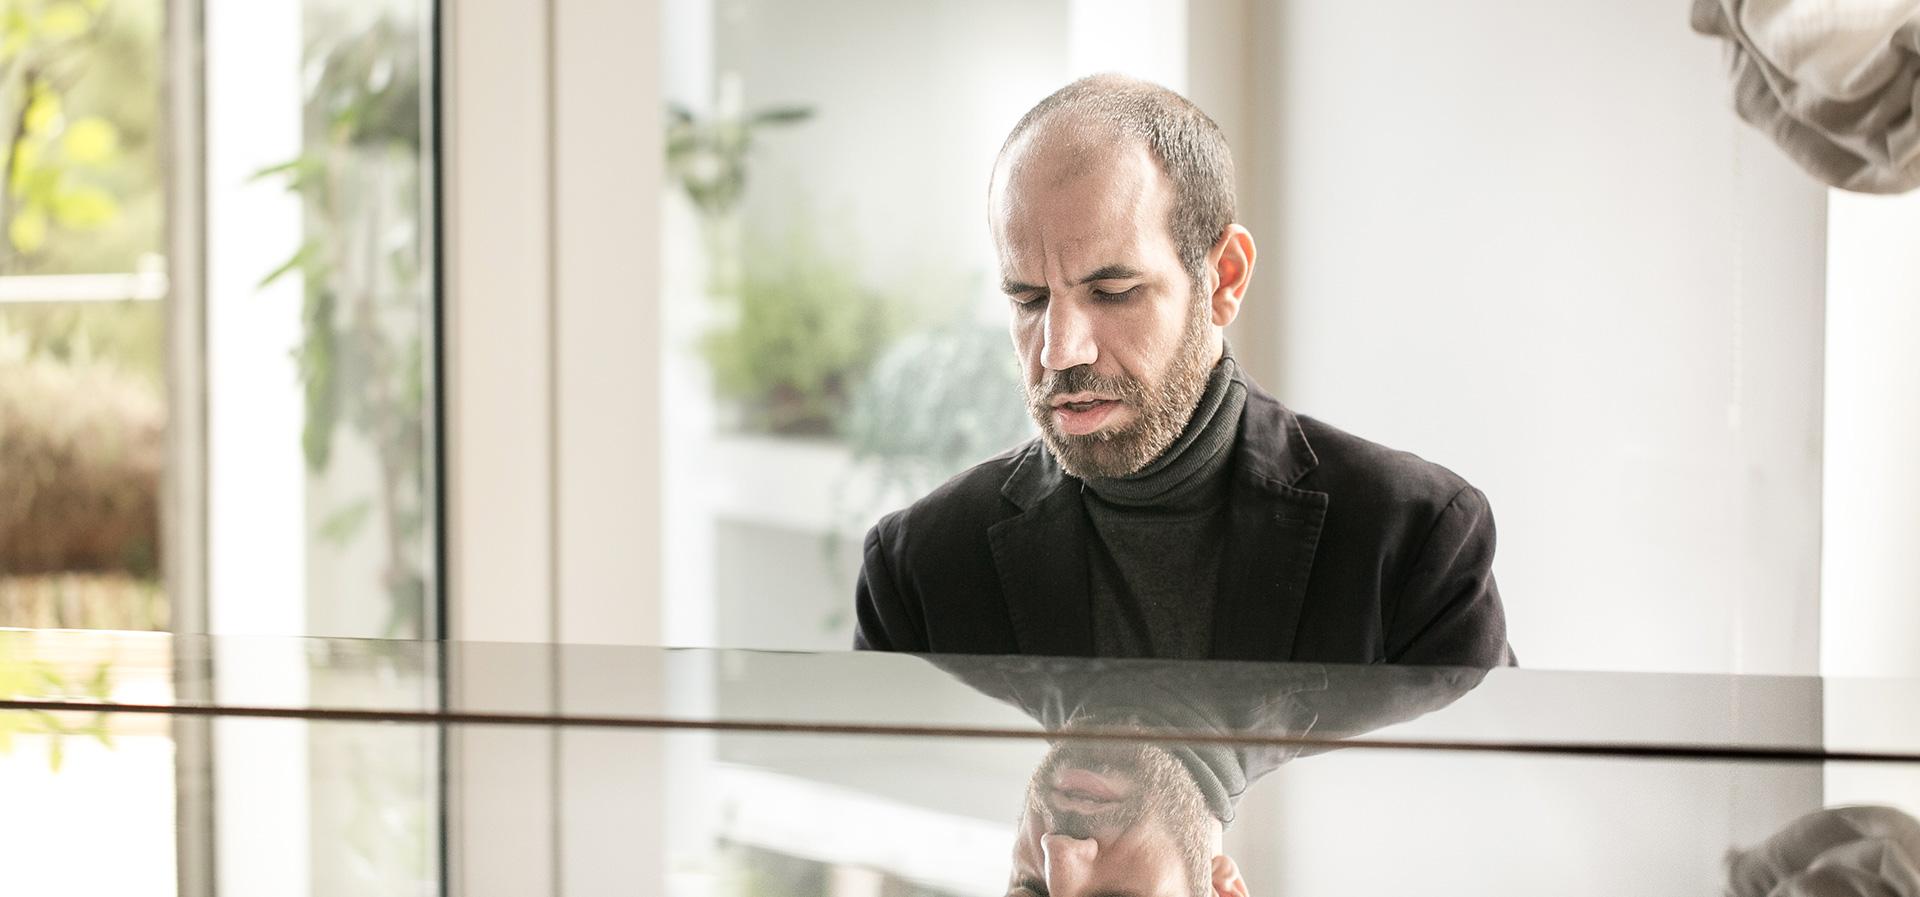 Yakir Arbib Playing Piano